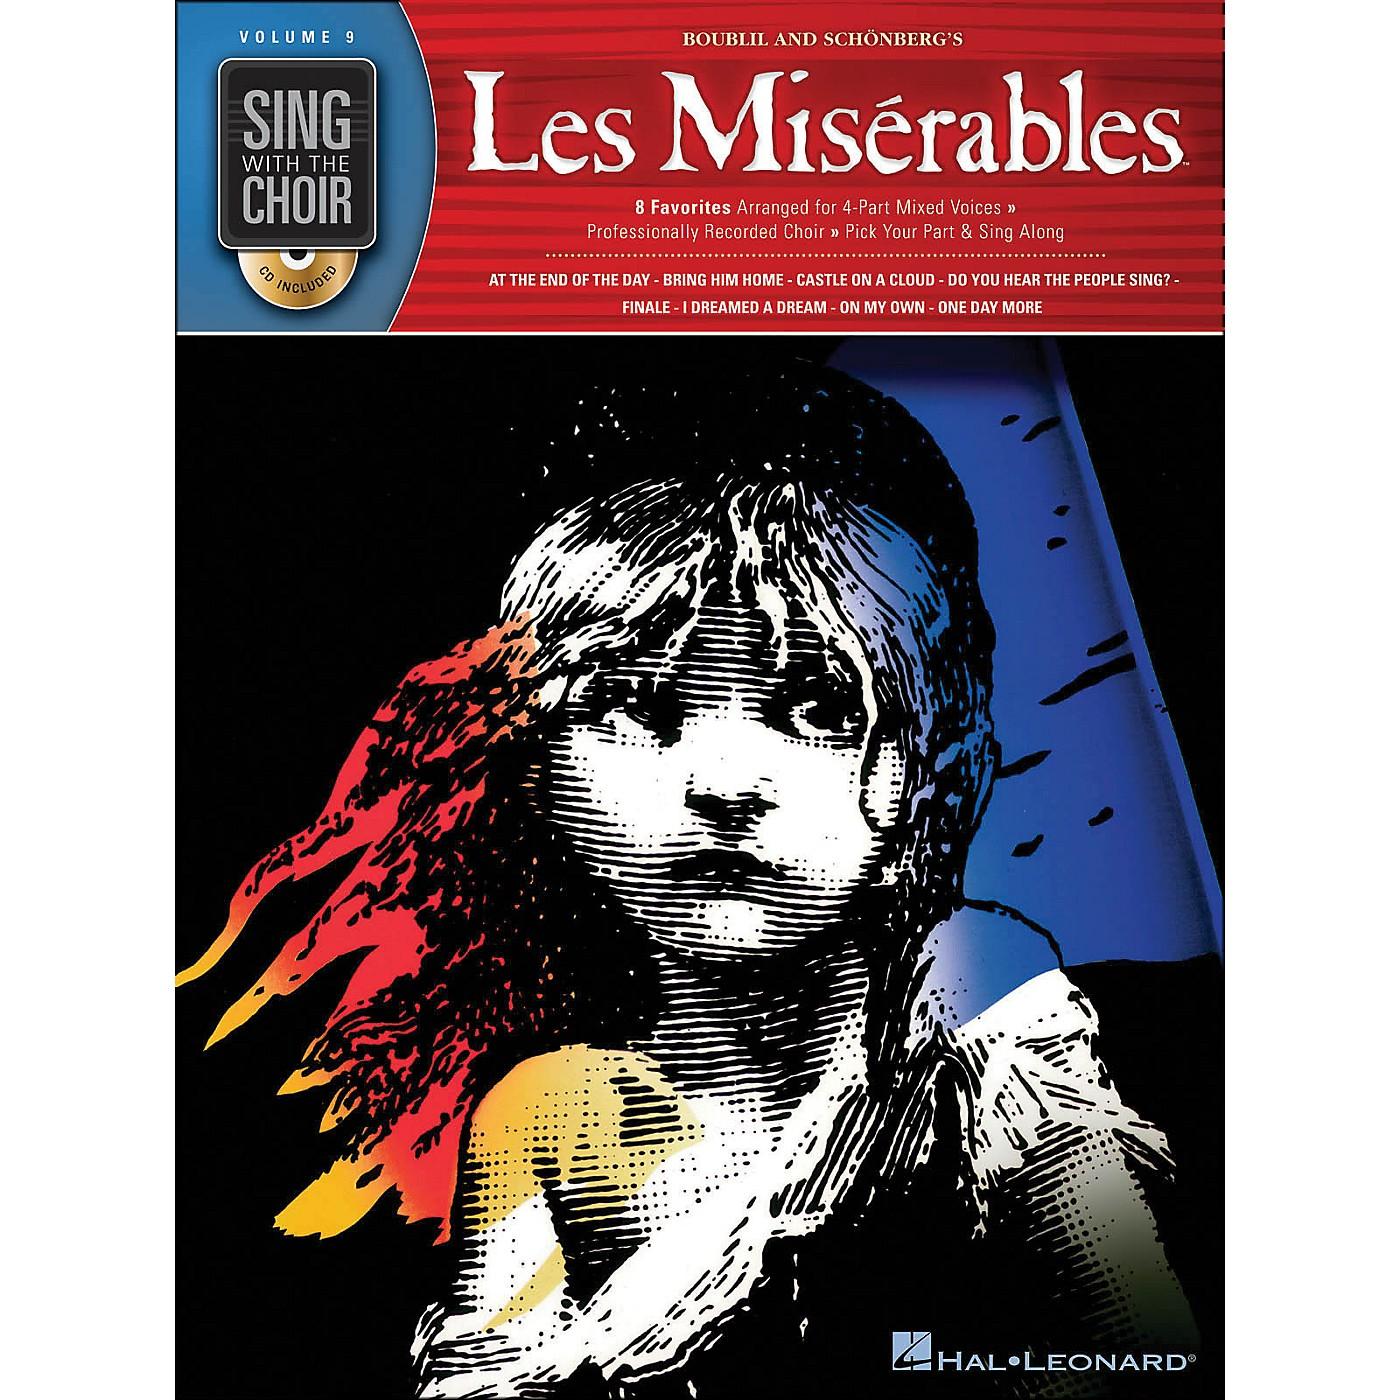 Hal Leonard Les Miserables - Sing with The Choir Series Vol. 9 Book/CD thumbnail